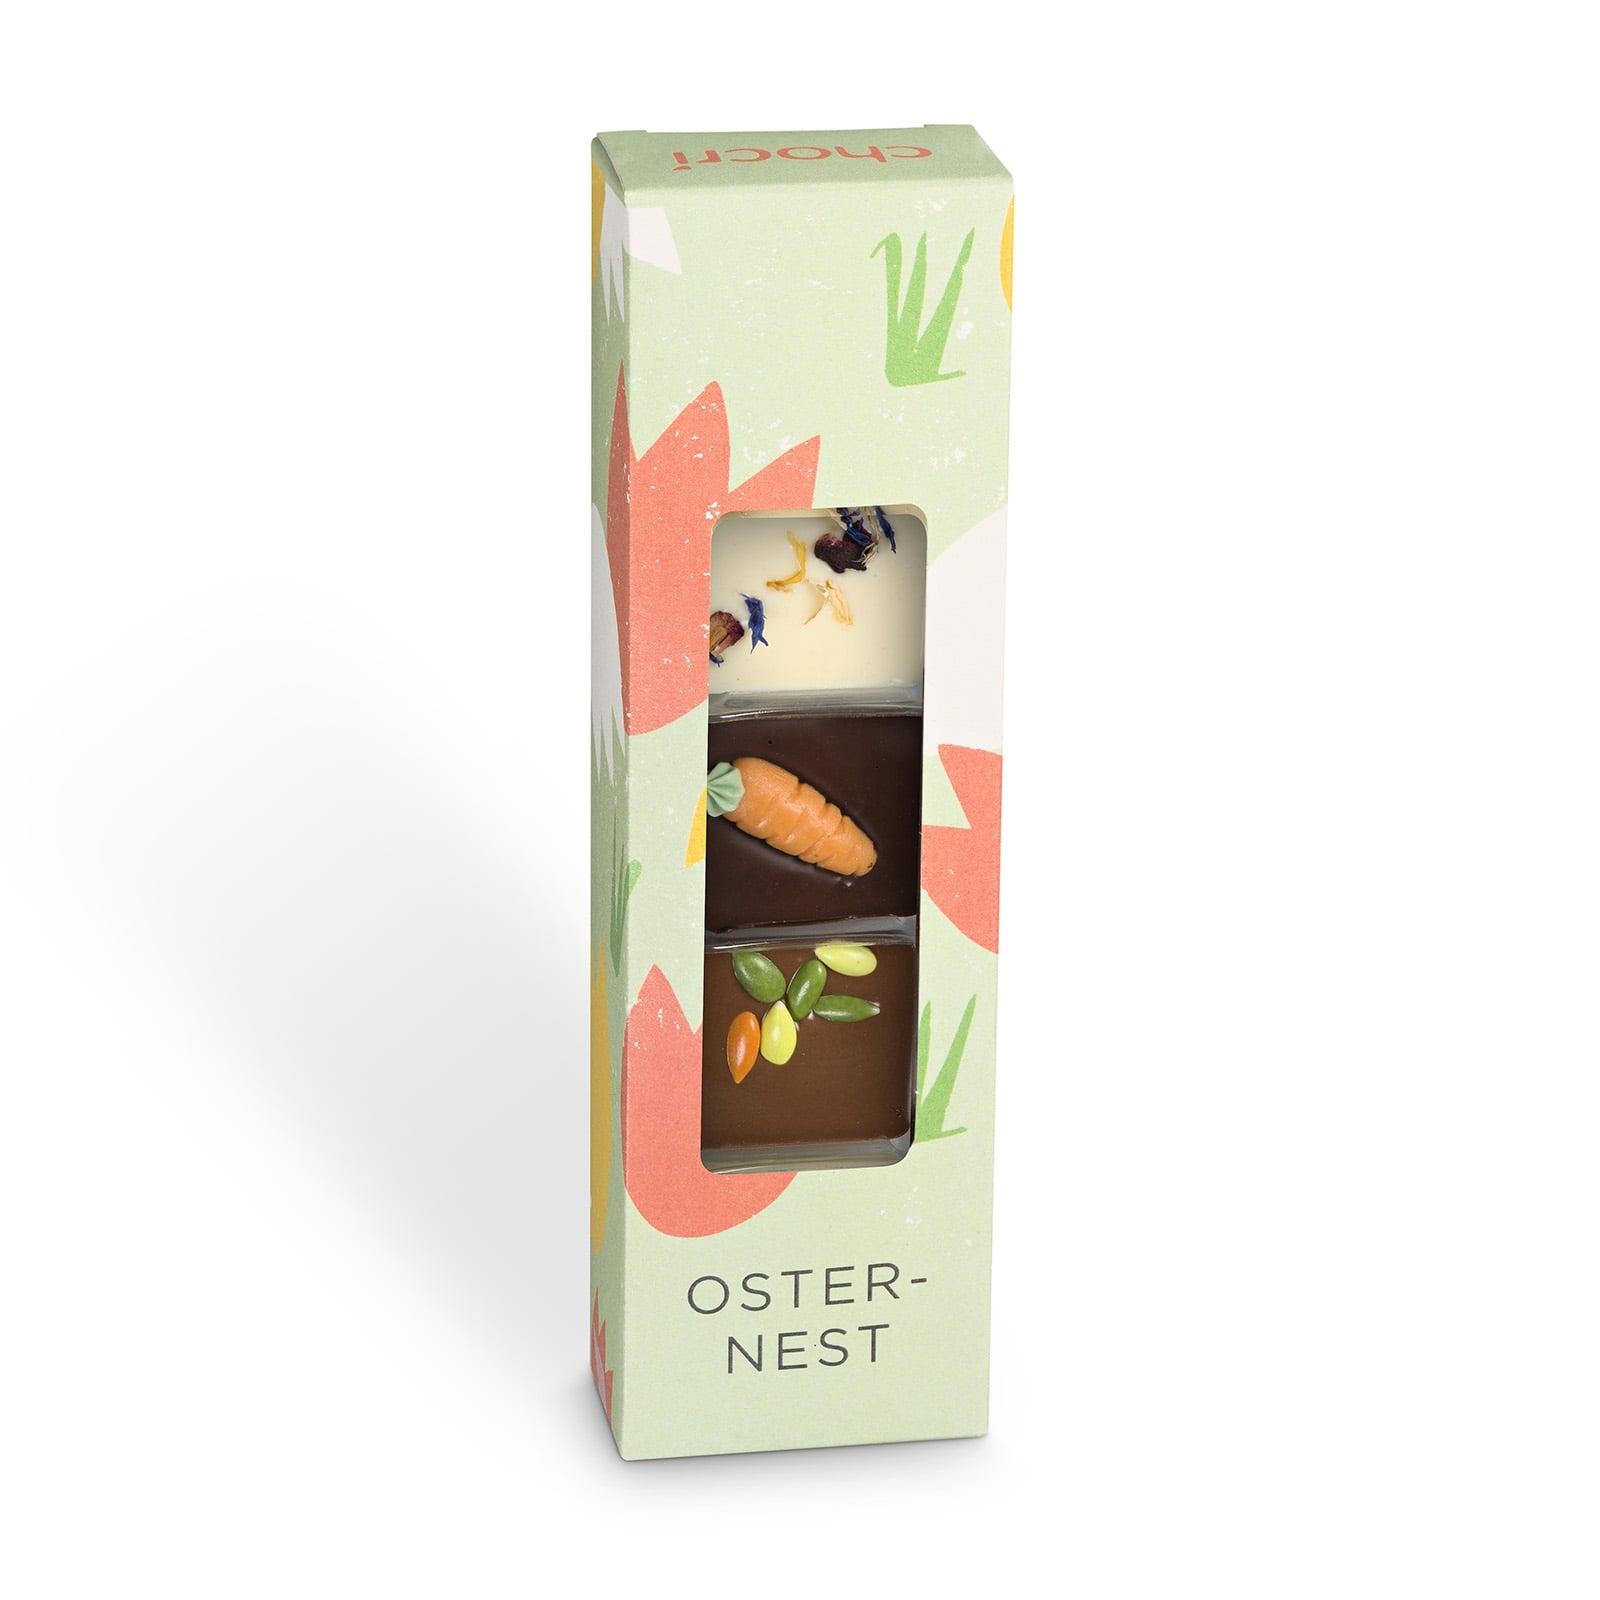 Köstlichsüsses - chocri 'Osternest' Mini Schokoladentafeln - Onlineshop Chocri